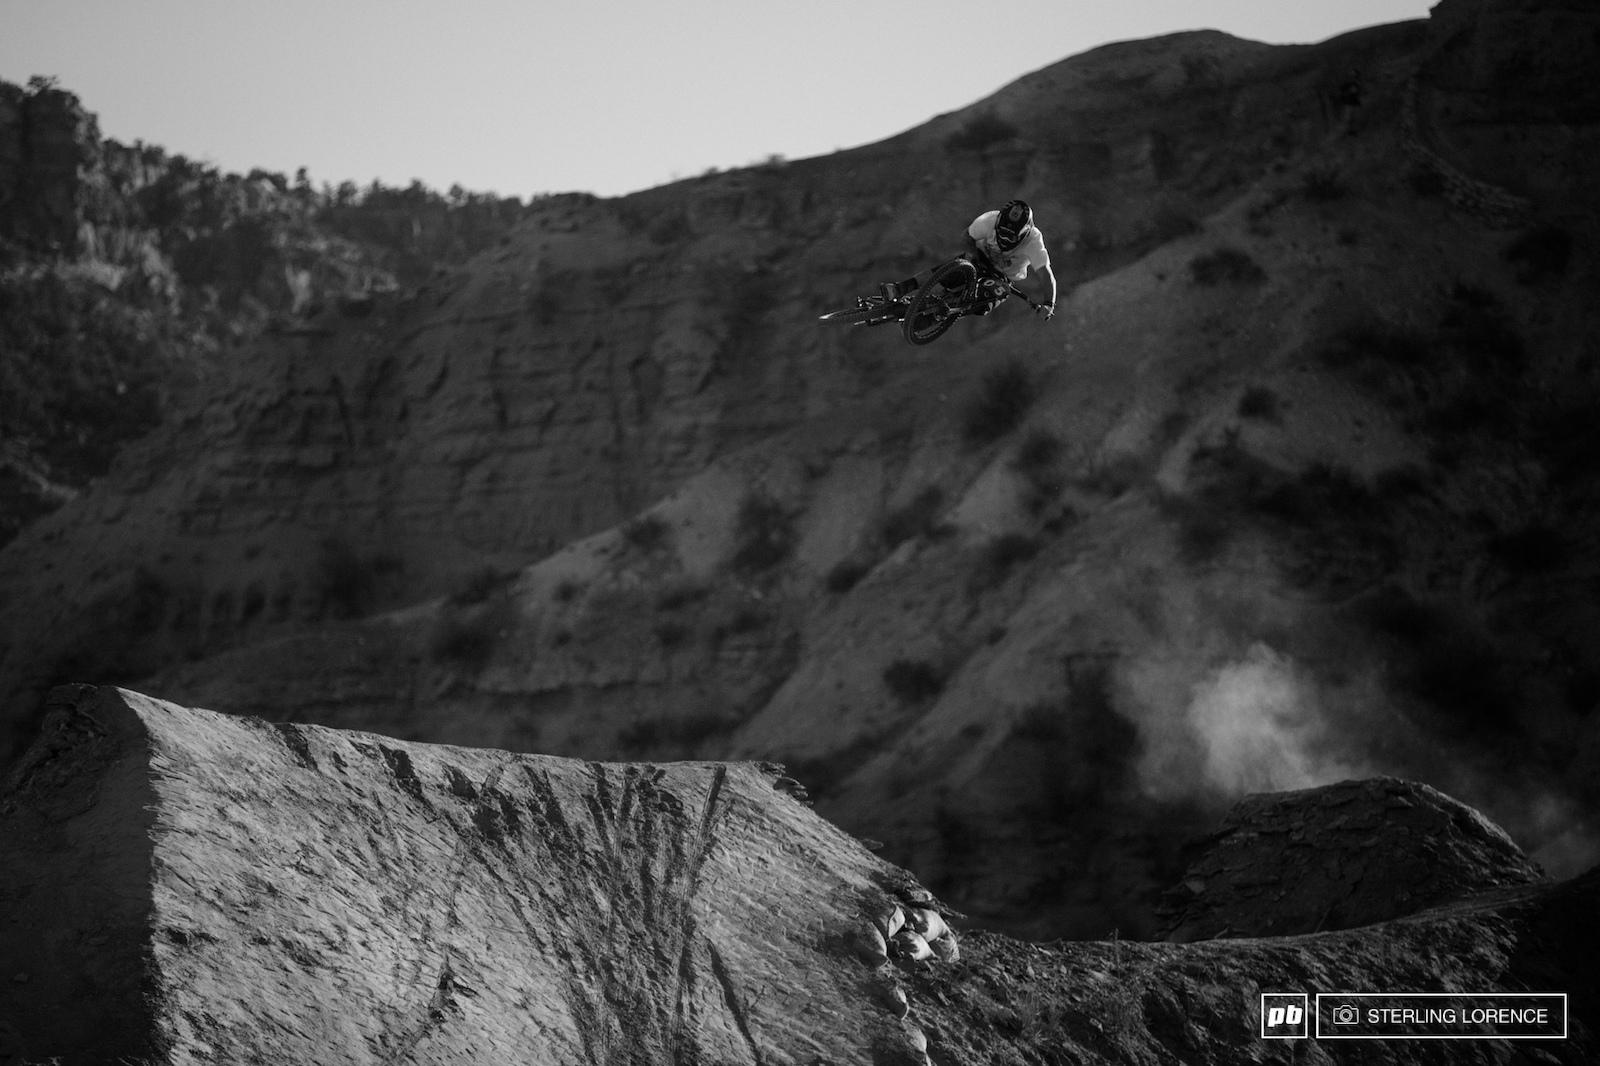 Graham Agassiz at 2015 RedBull Rampage Virgin Utah USA